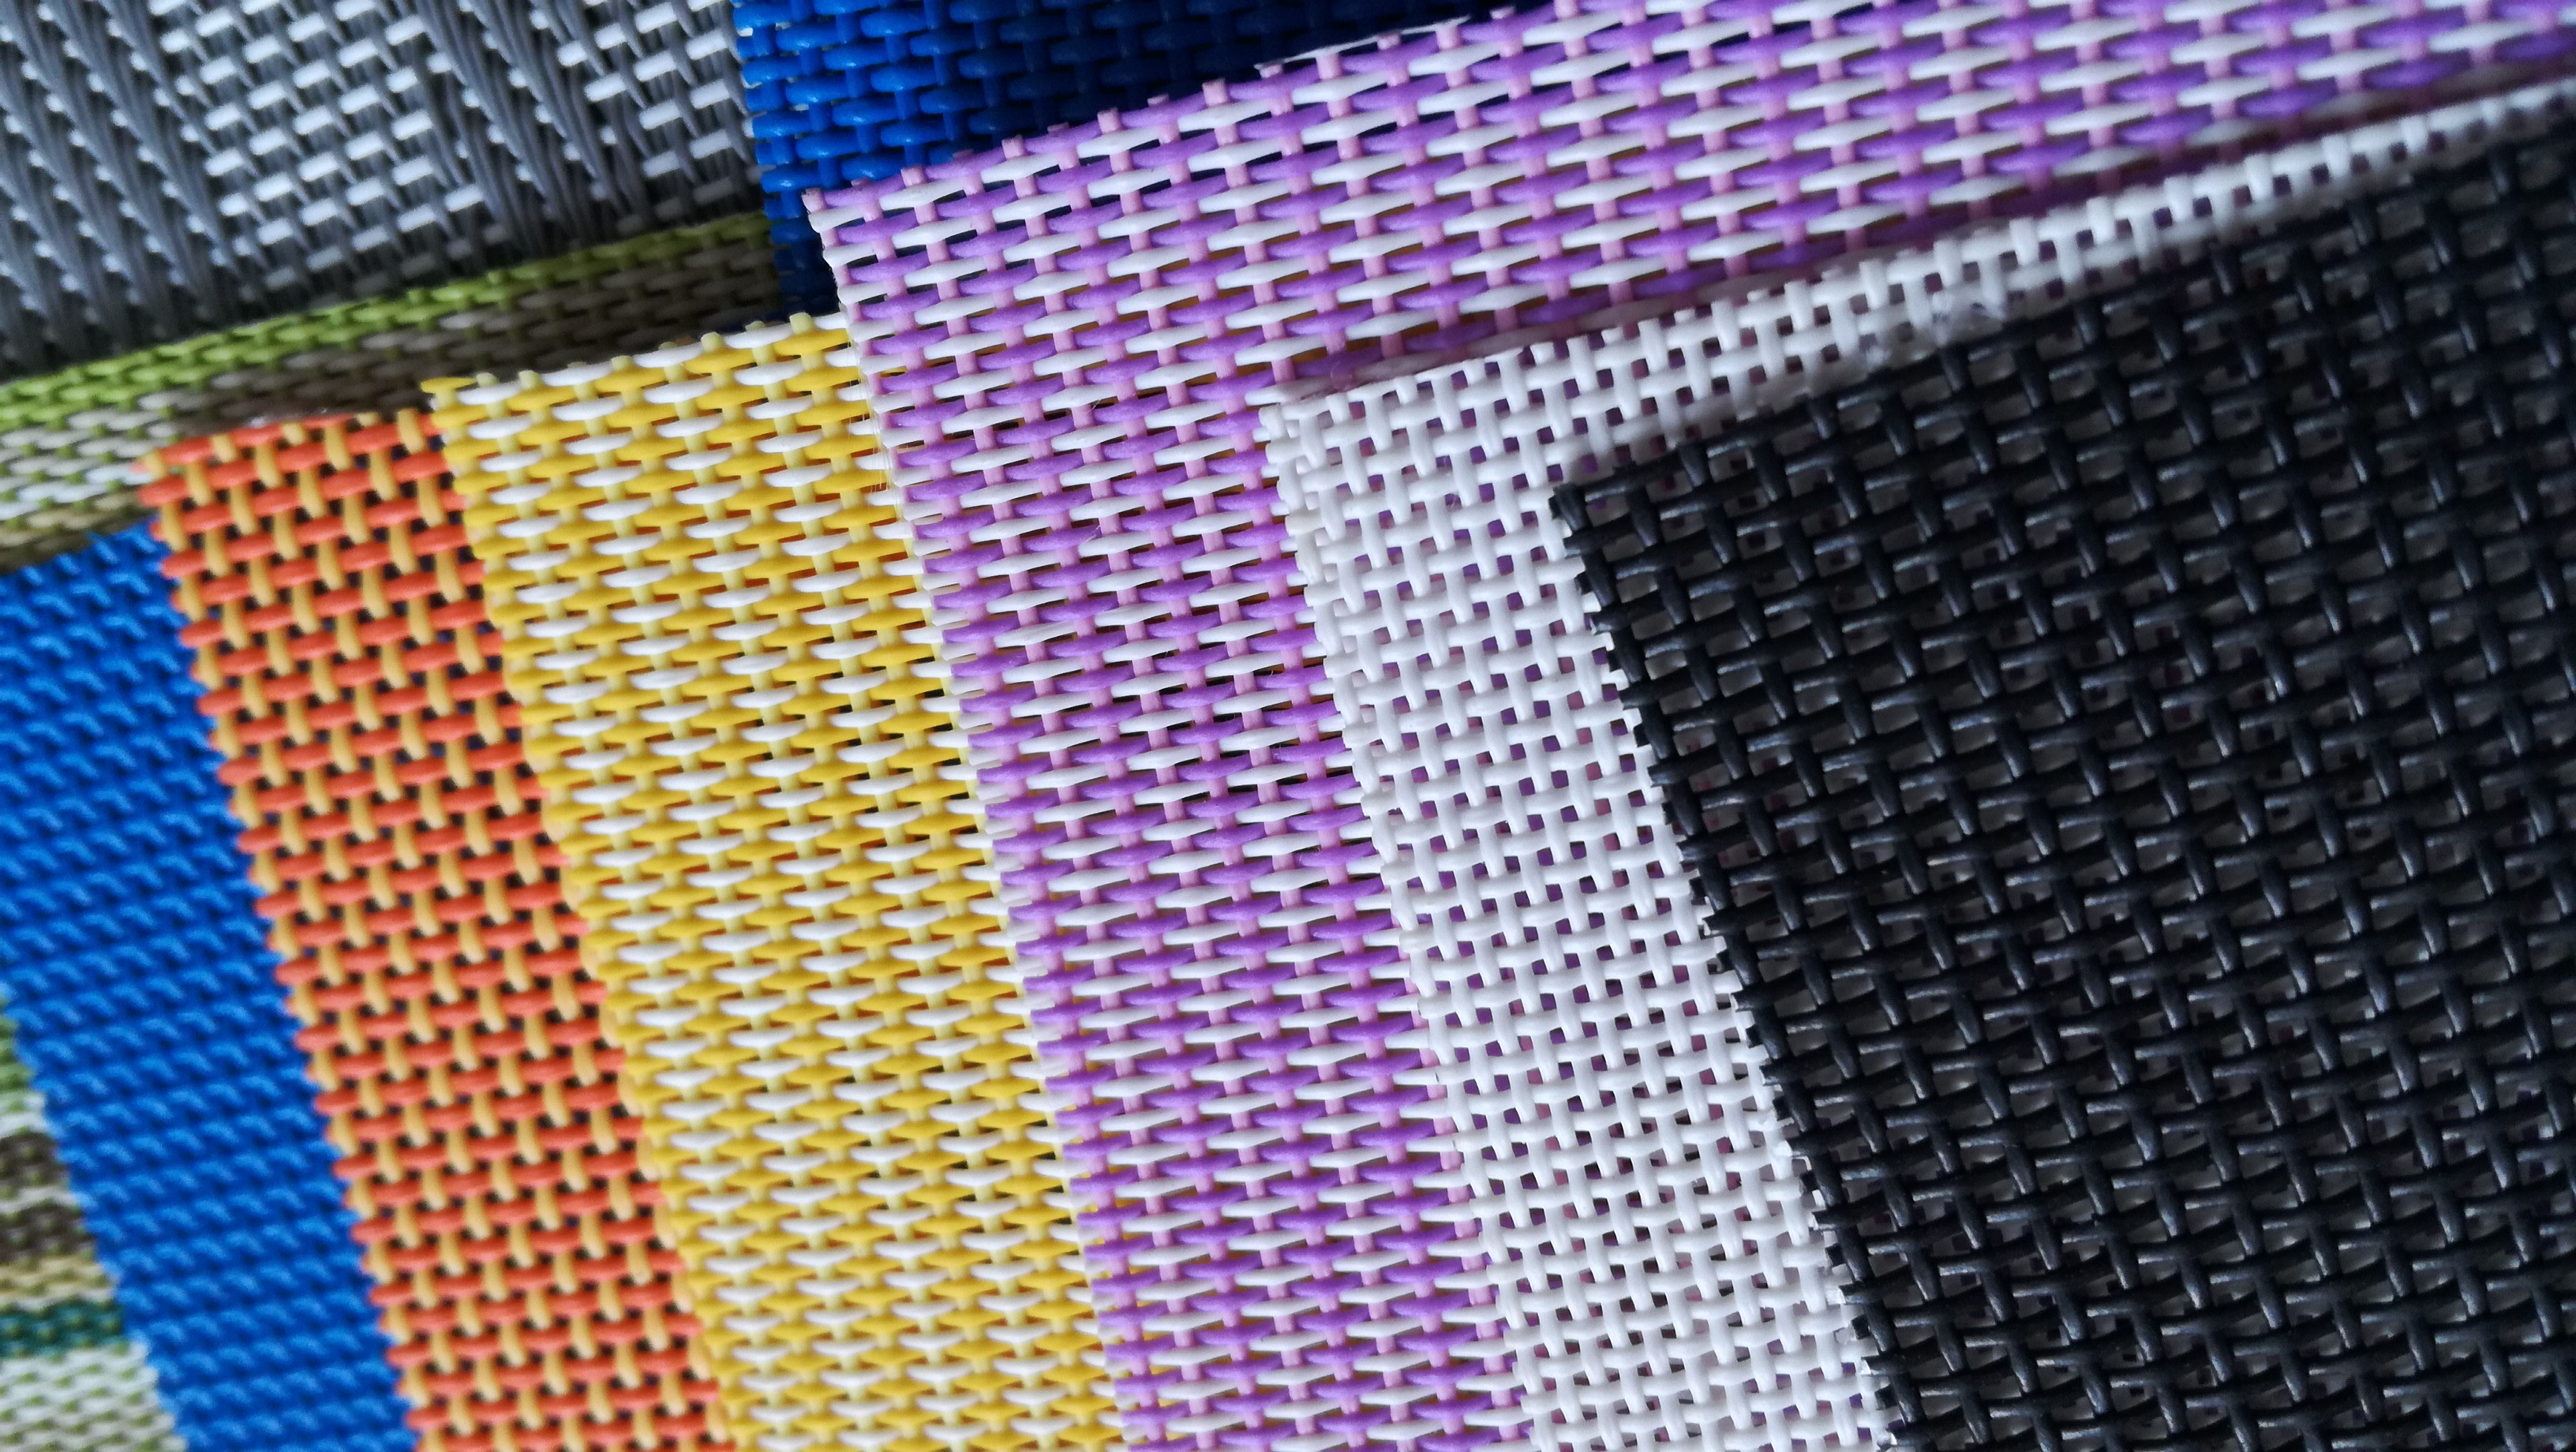 XUANKE MESH FABRIC PRODUCTS CO ,LTD_Textilene mesh fabric